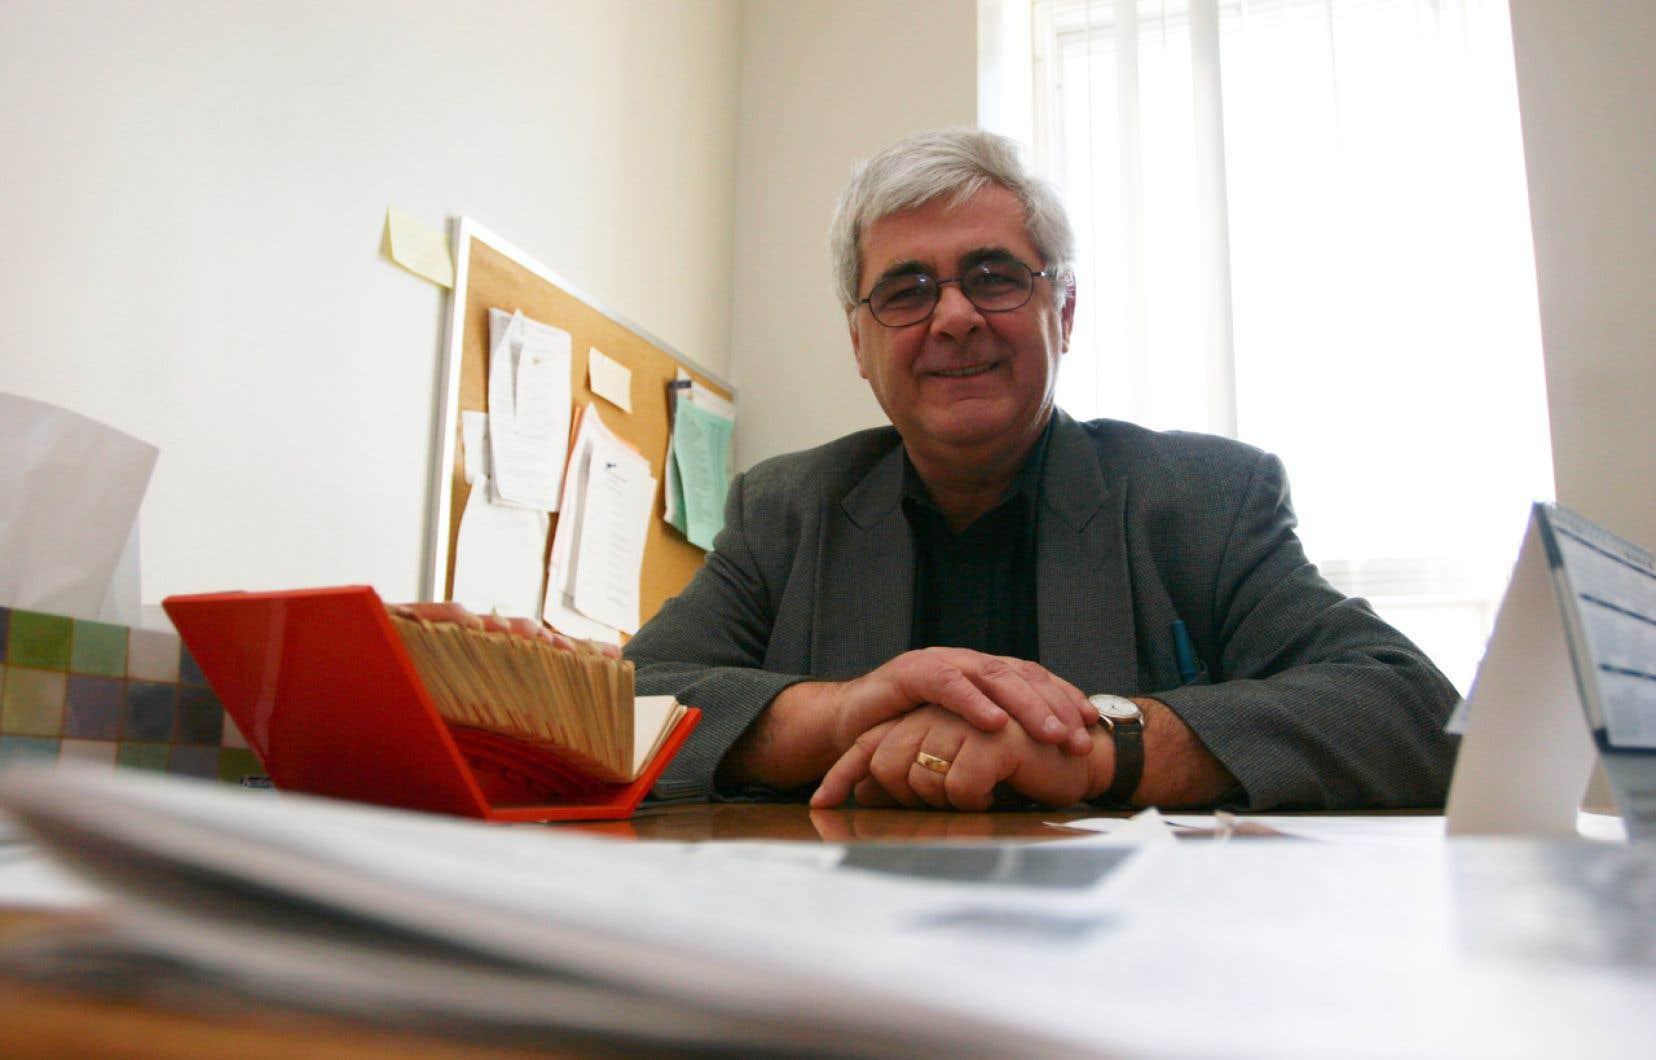 Jean-Claude Picard